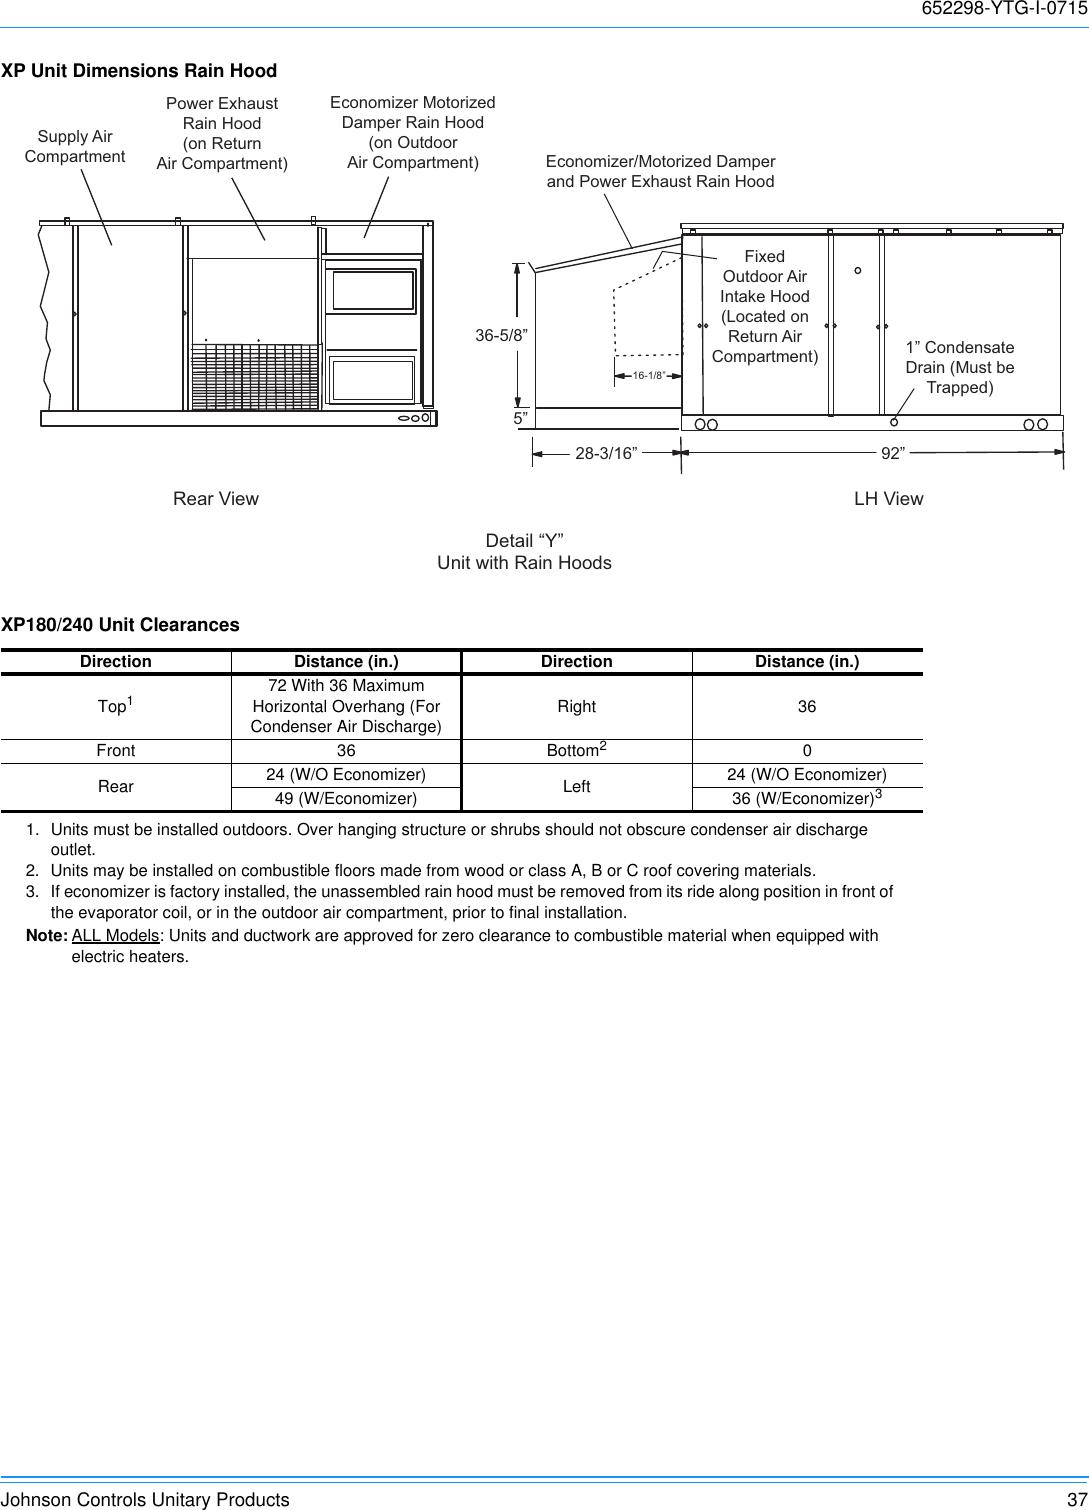 York Xp Sunline Technical Guide Xp York Heat Pump Wiring Diagram on